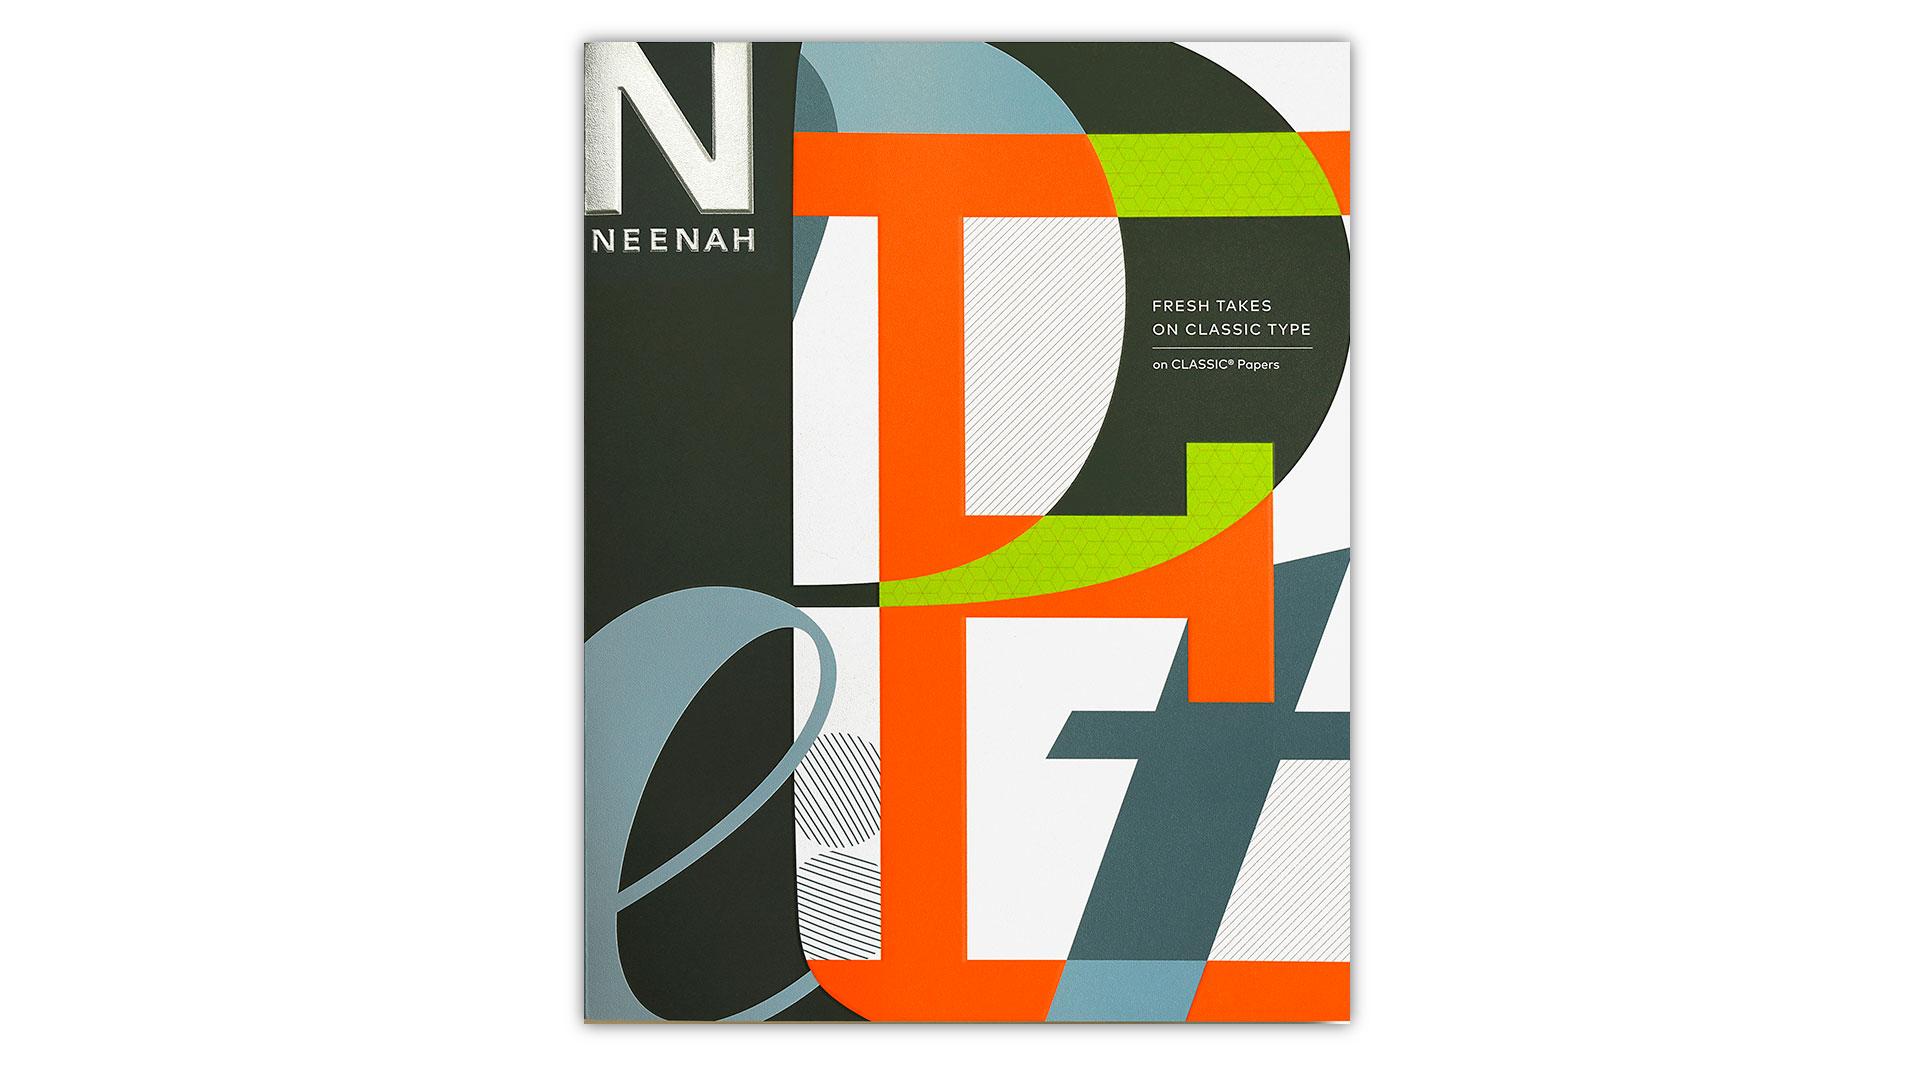 Neenah-Fresh-Takes-Classics-1